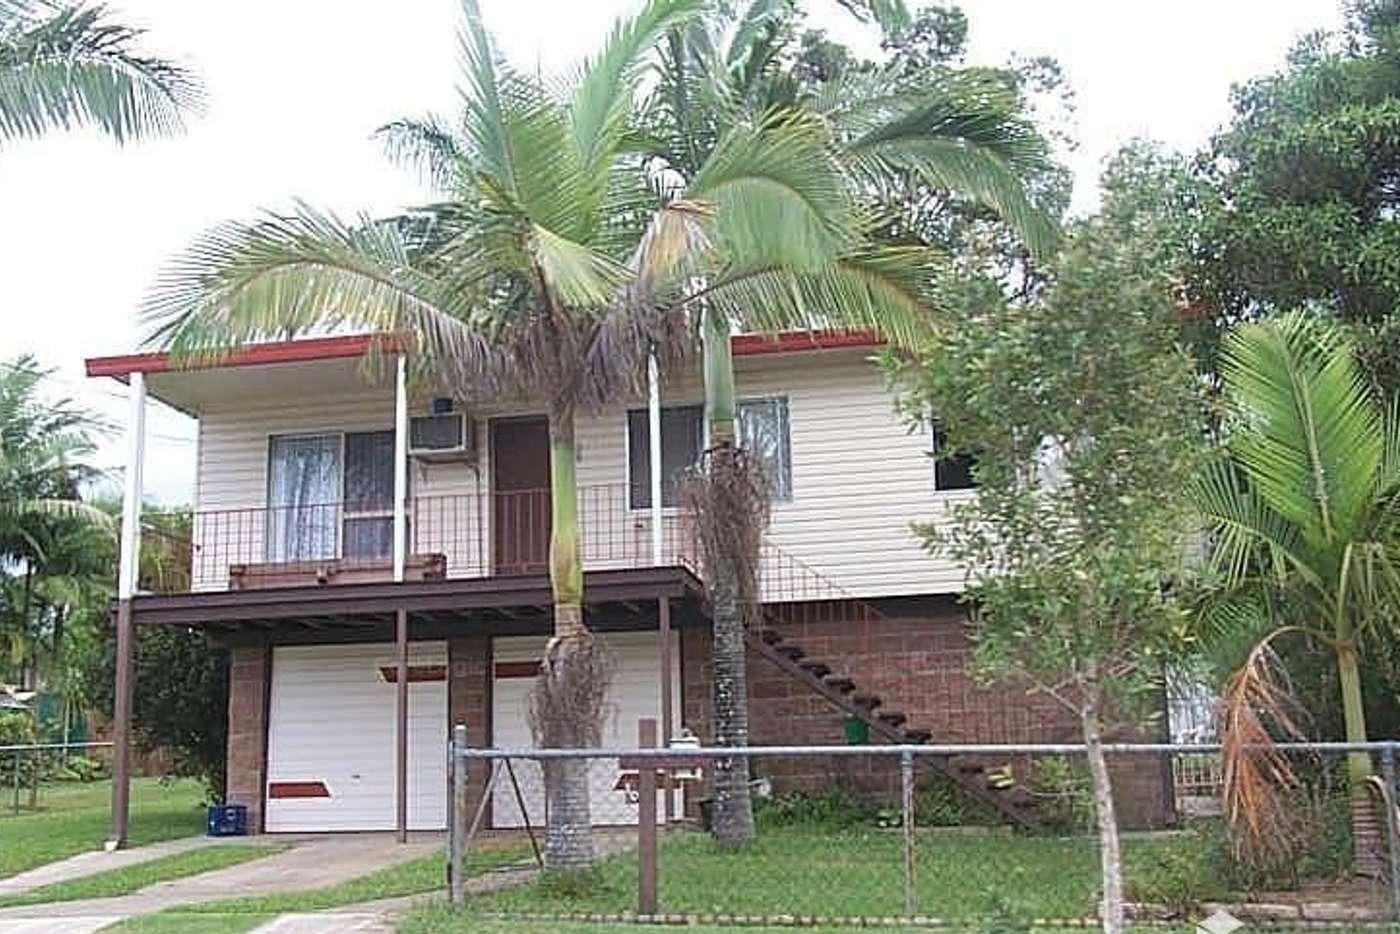 Main view of Homely house listing, 10 Cypress Street, Woodridge QLD 4114